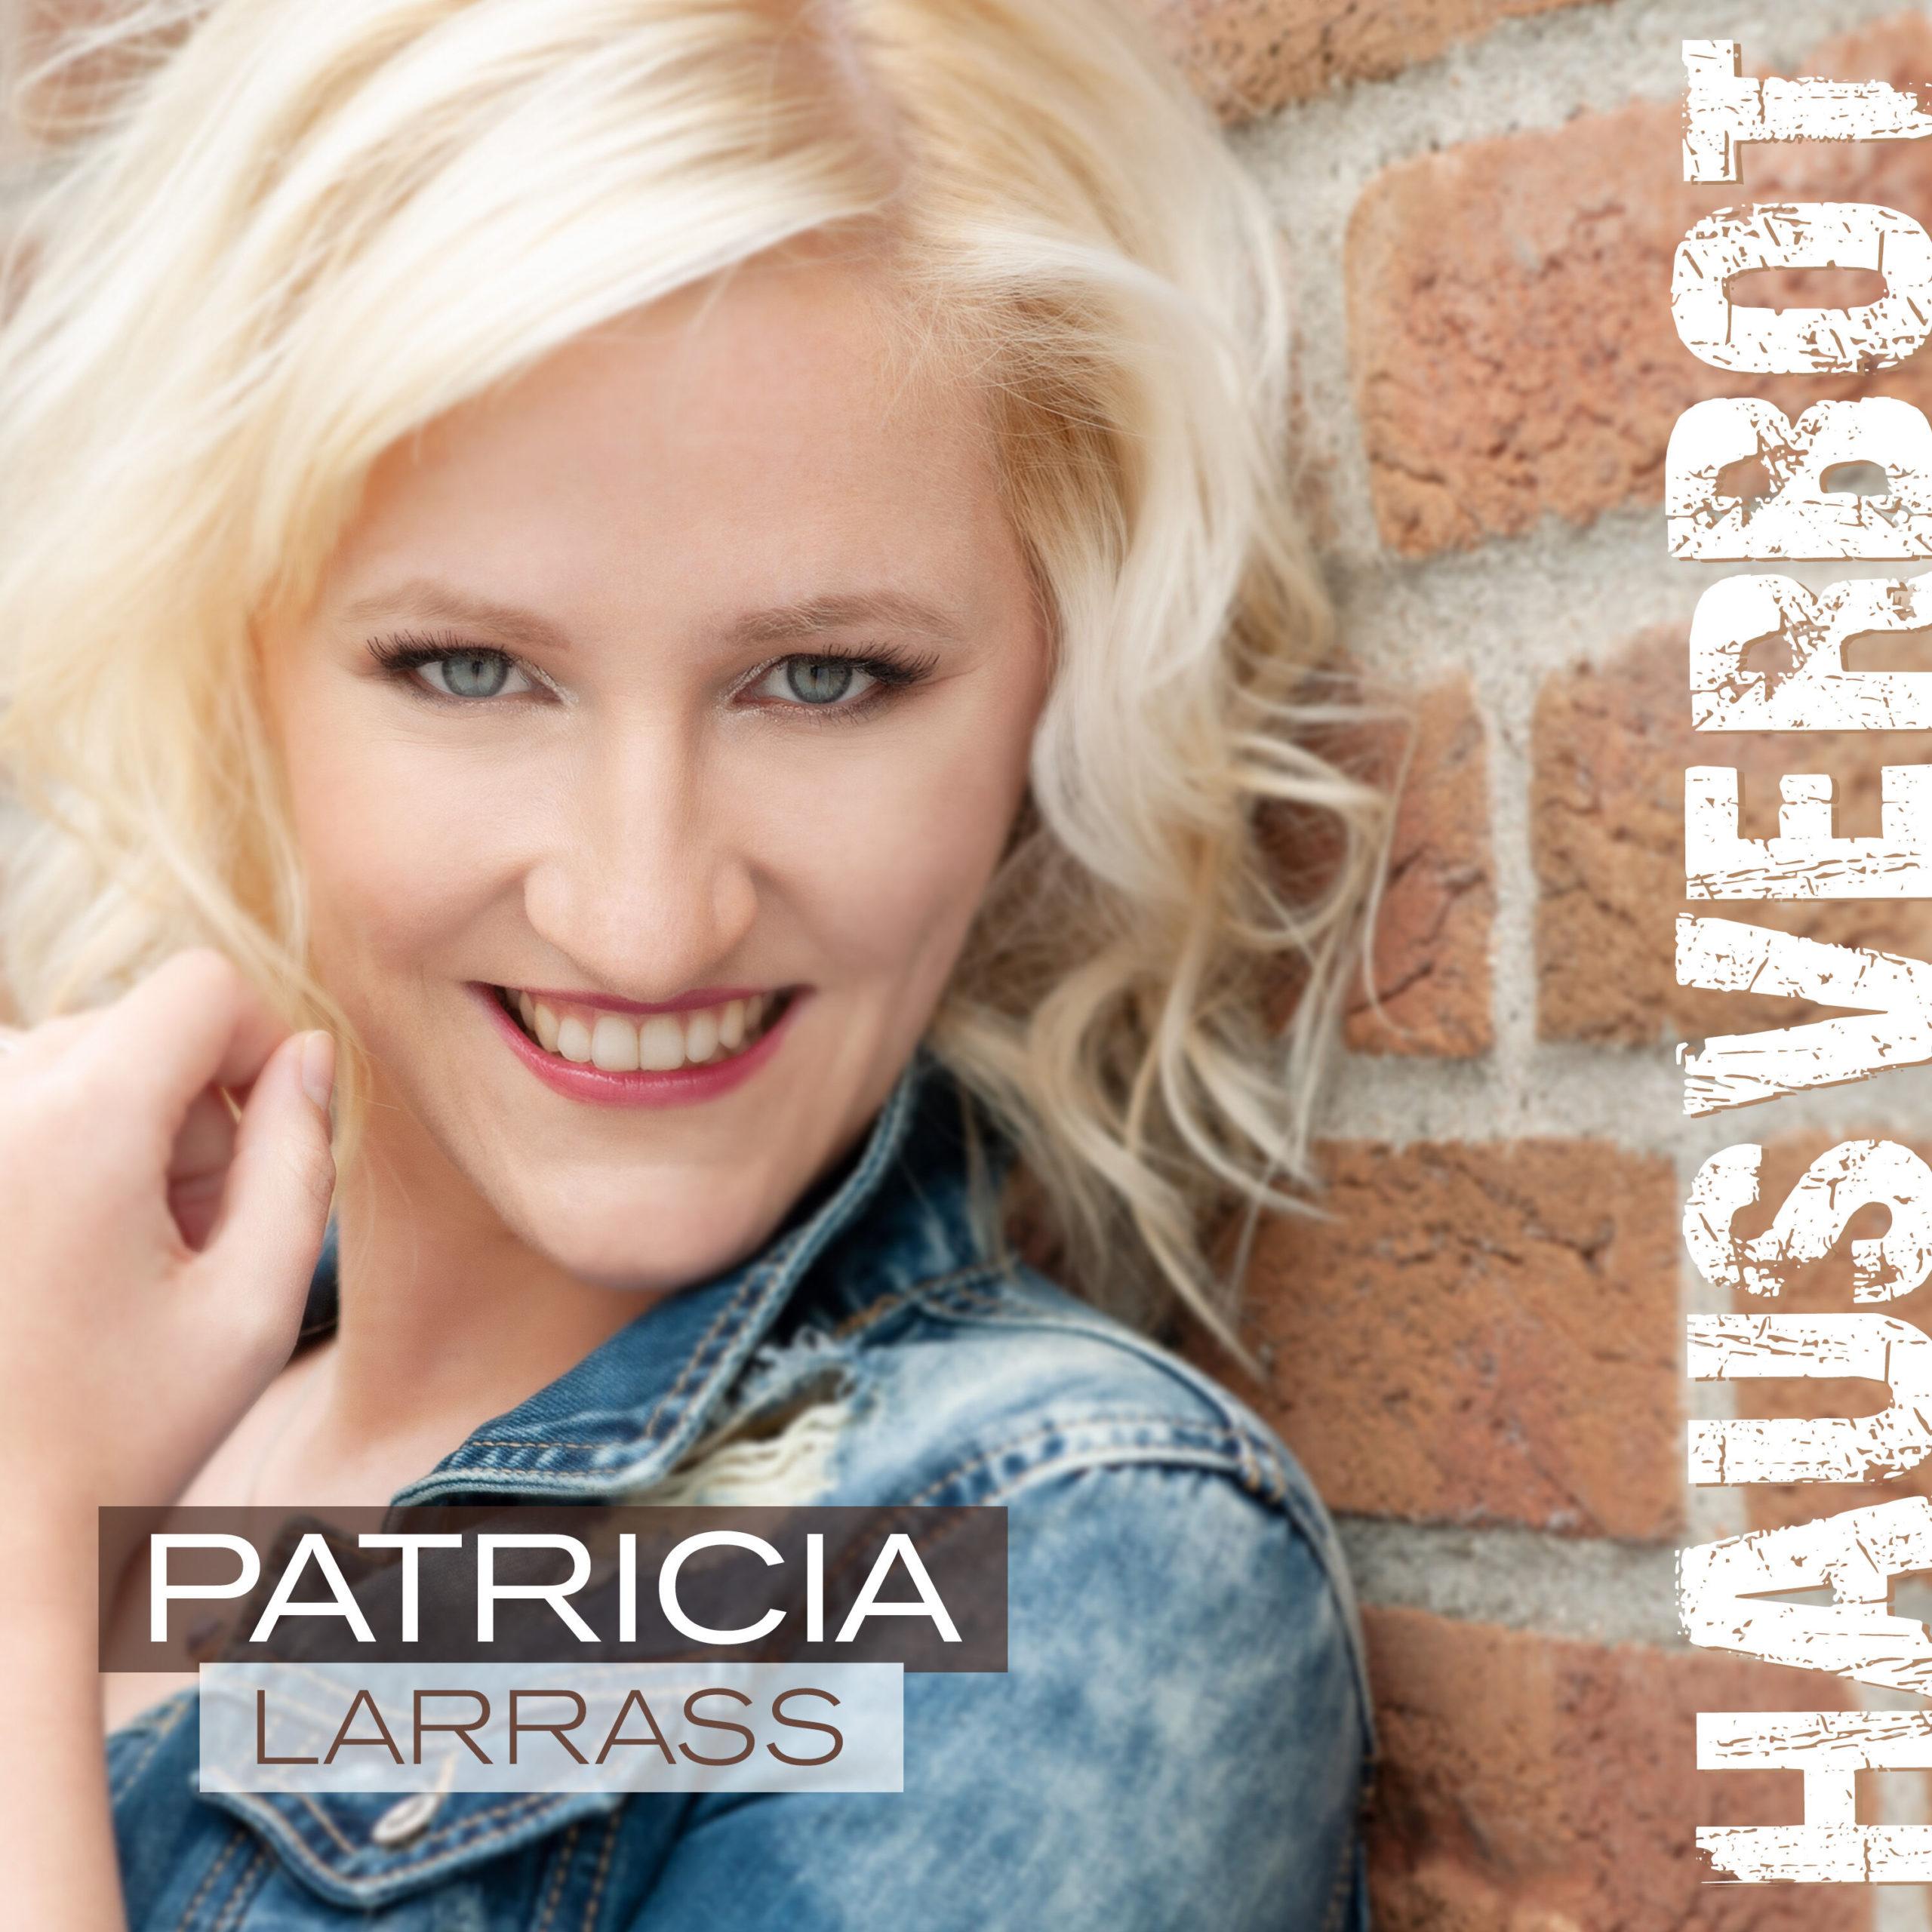 Patricia Larraß - Hausverbot (2020)